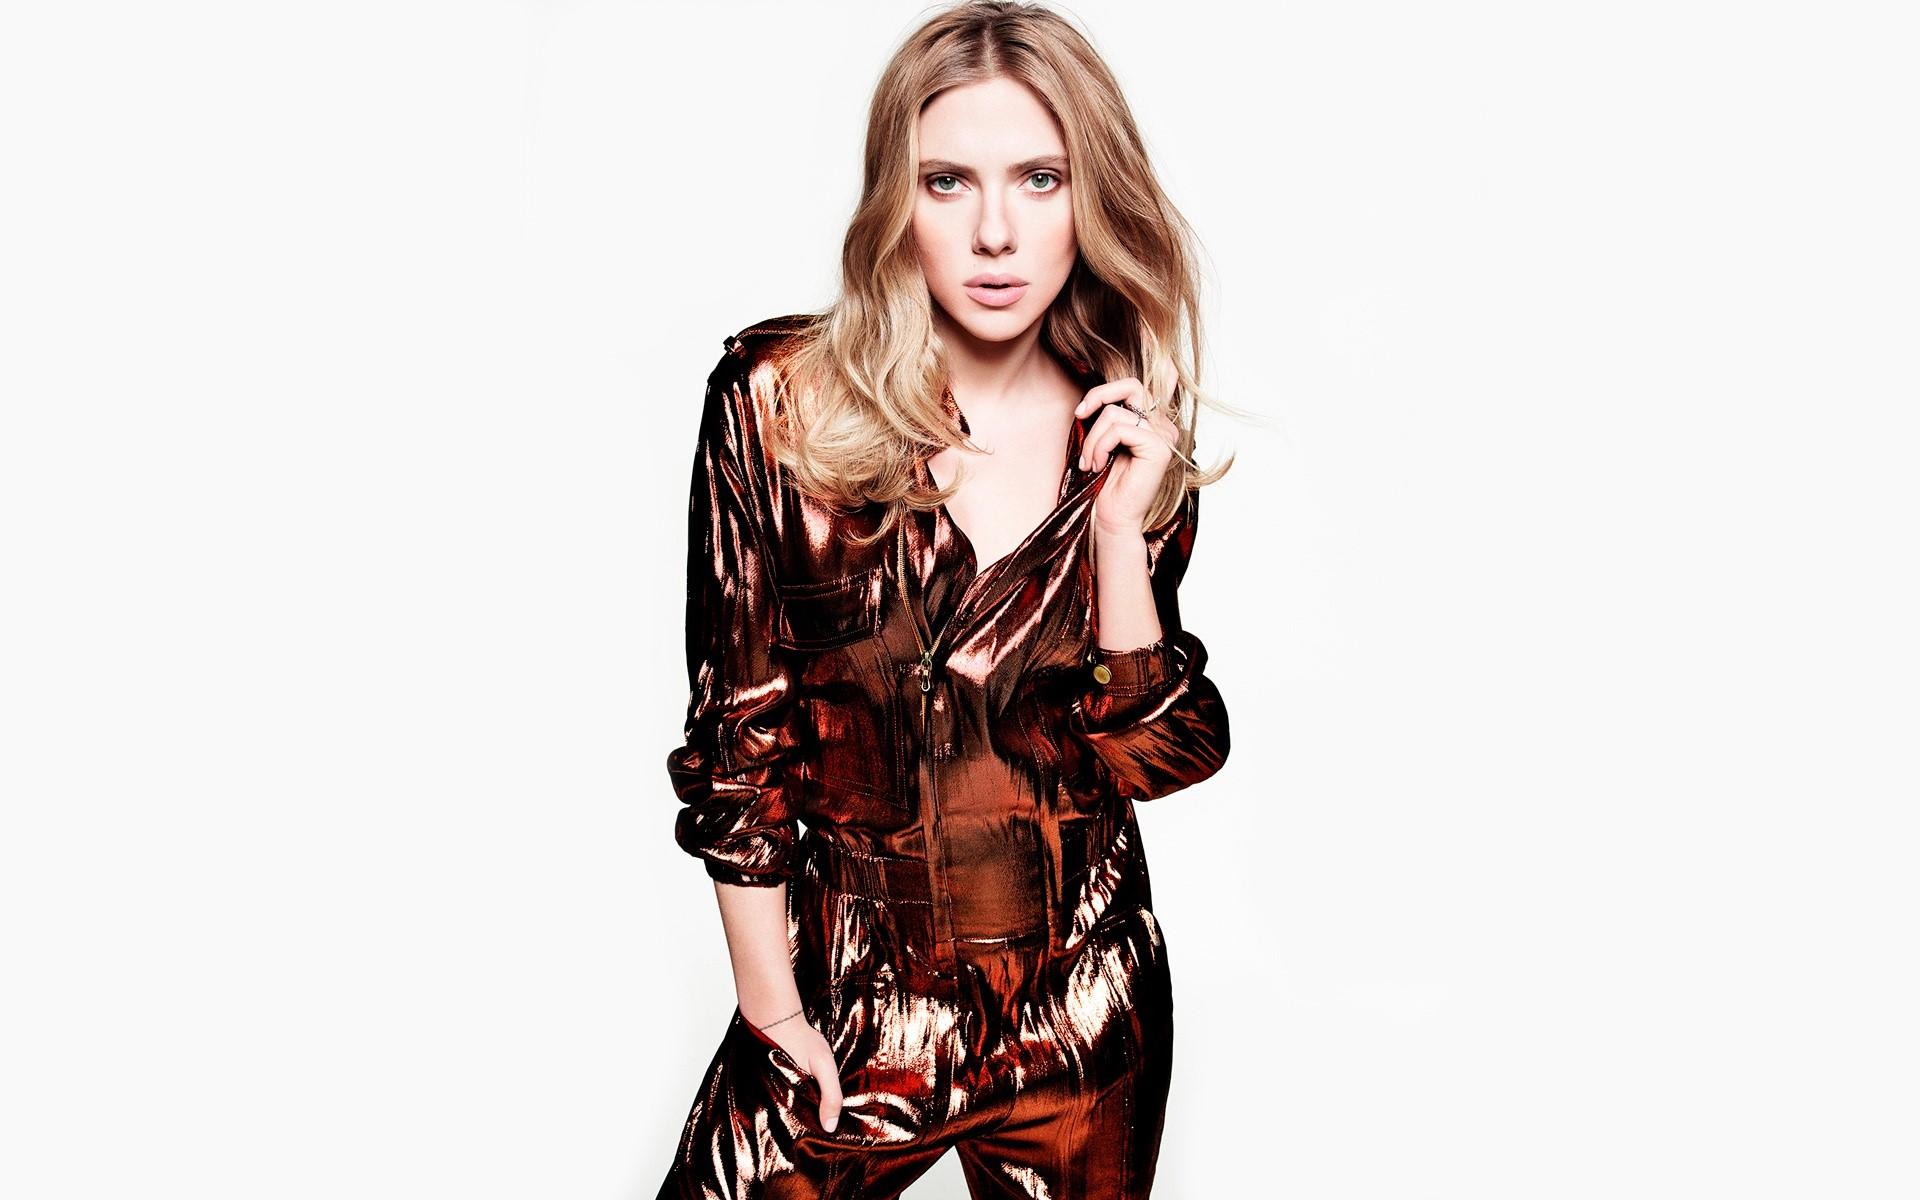 Wallpaper Scarlett Johansson with long hair